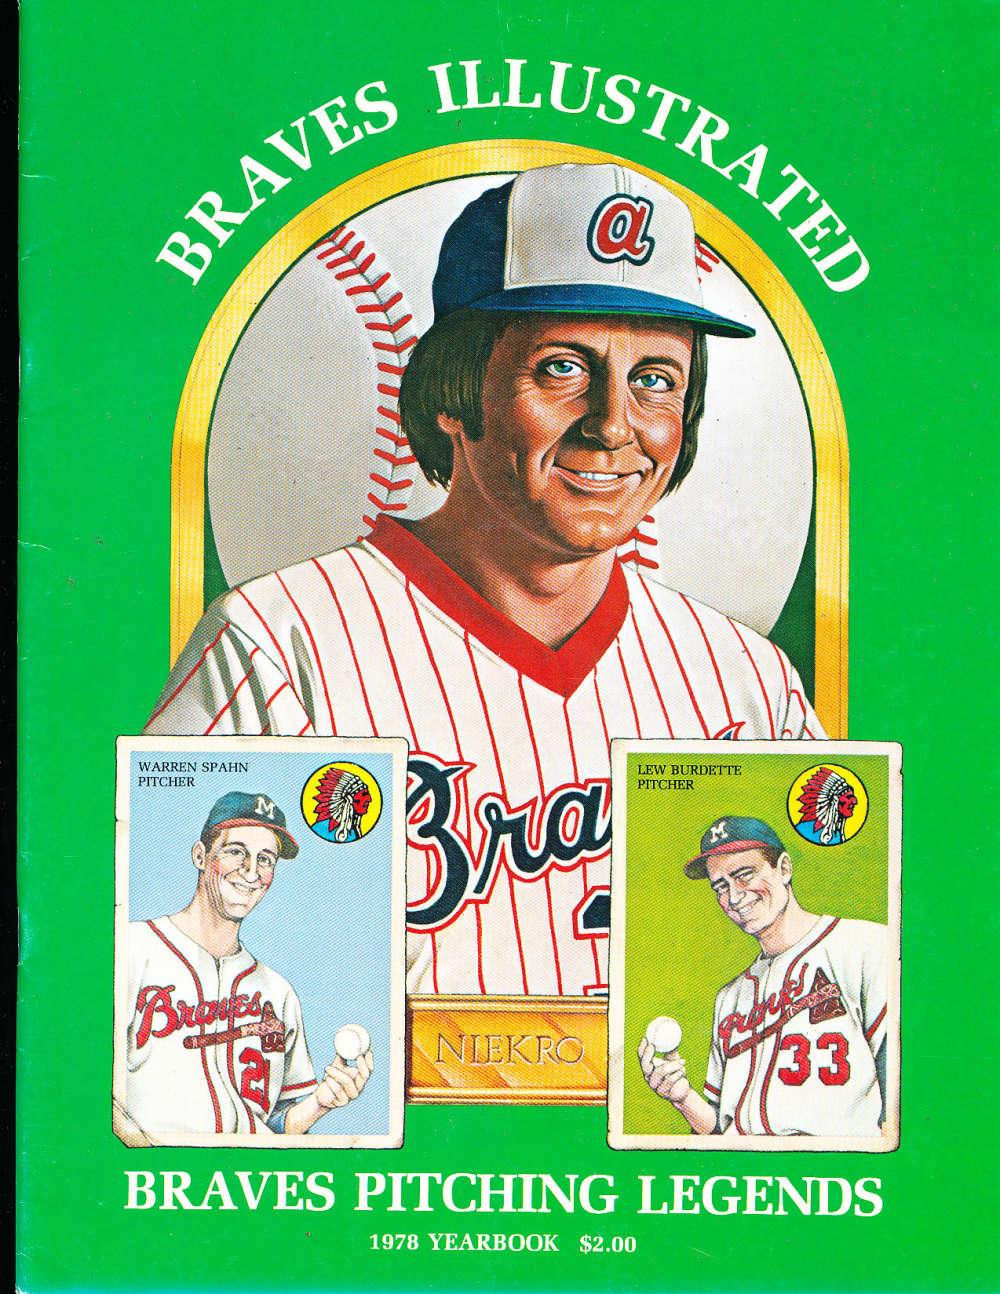 1978 Atlanta Braves Baseball Yearbook nm a1